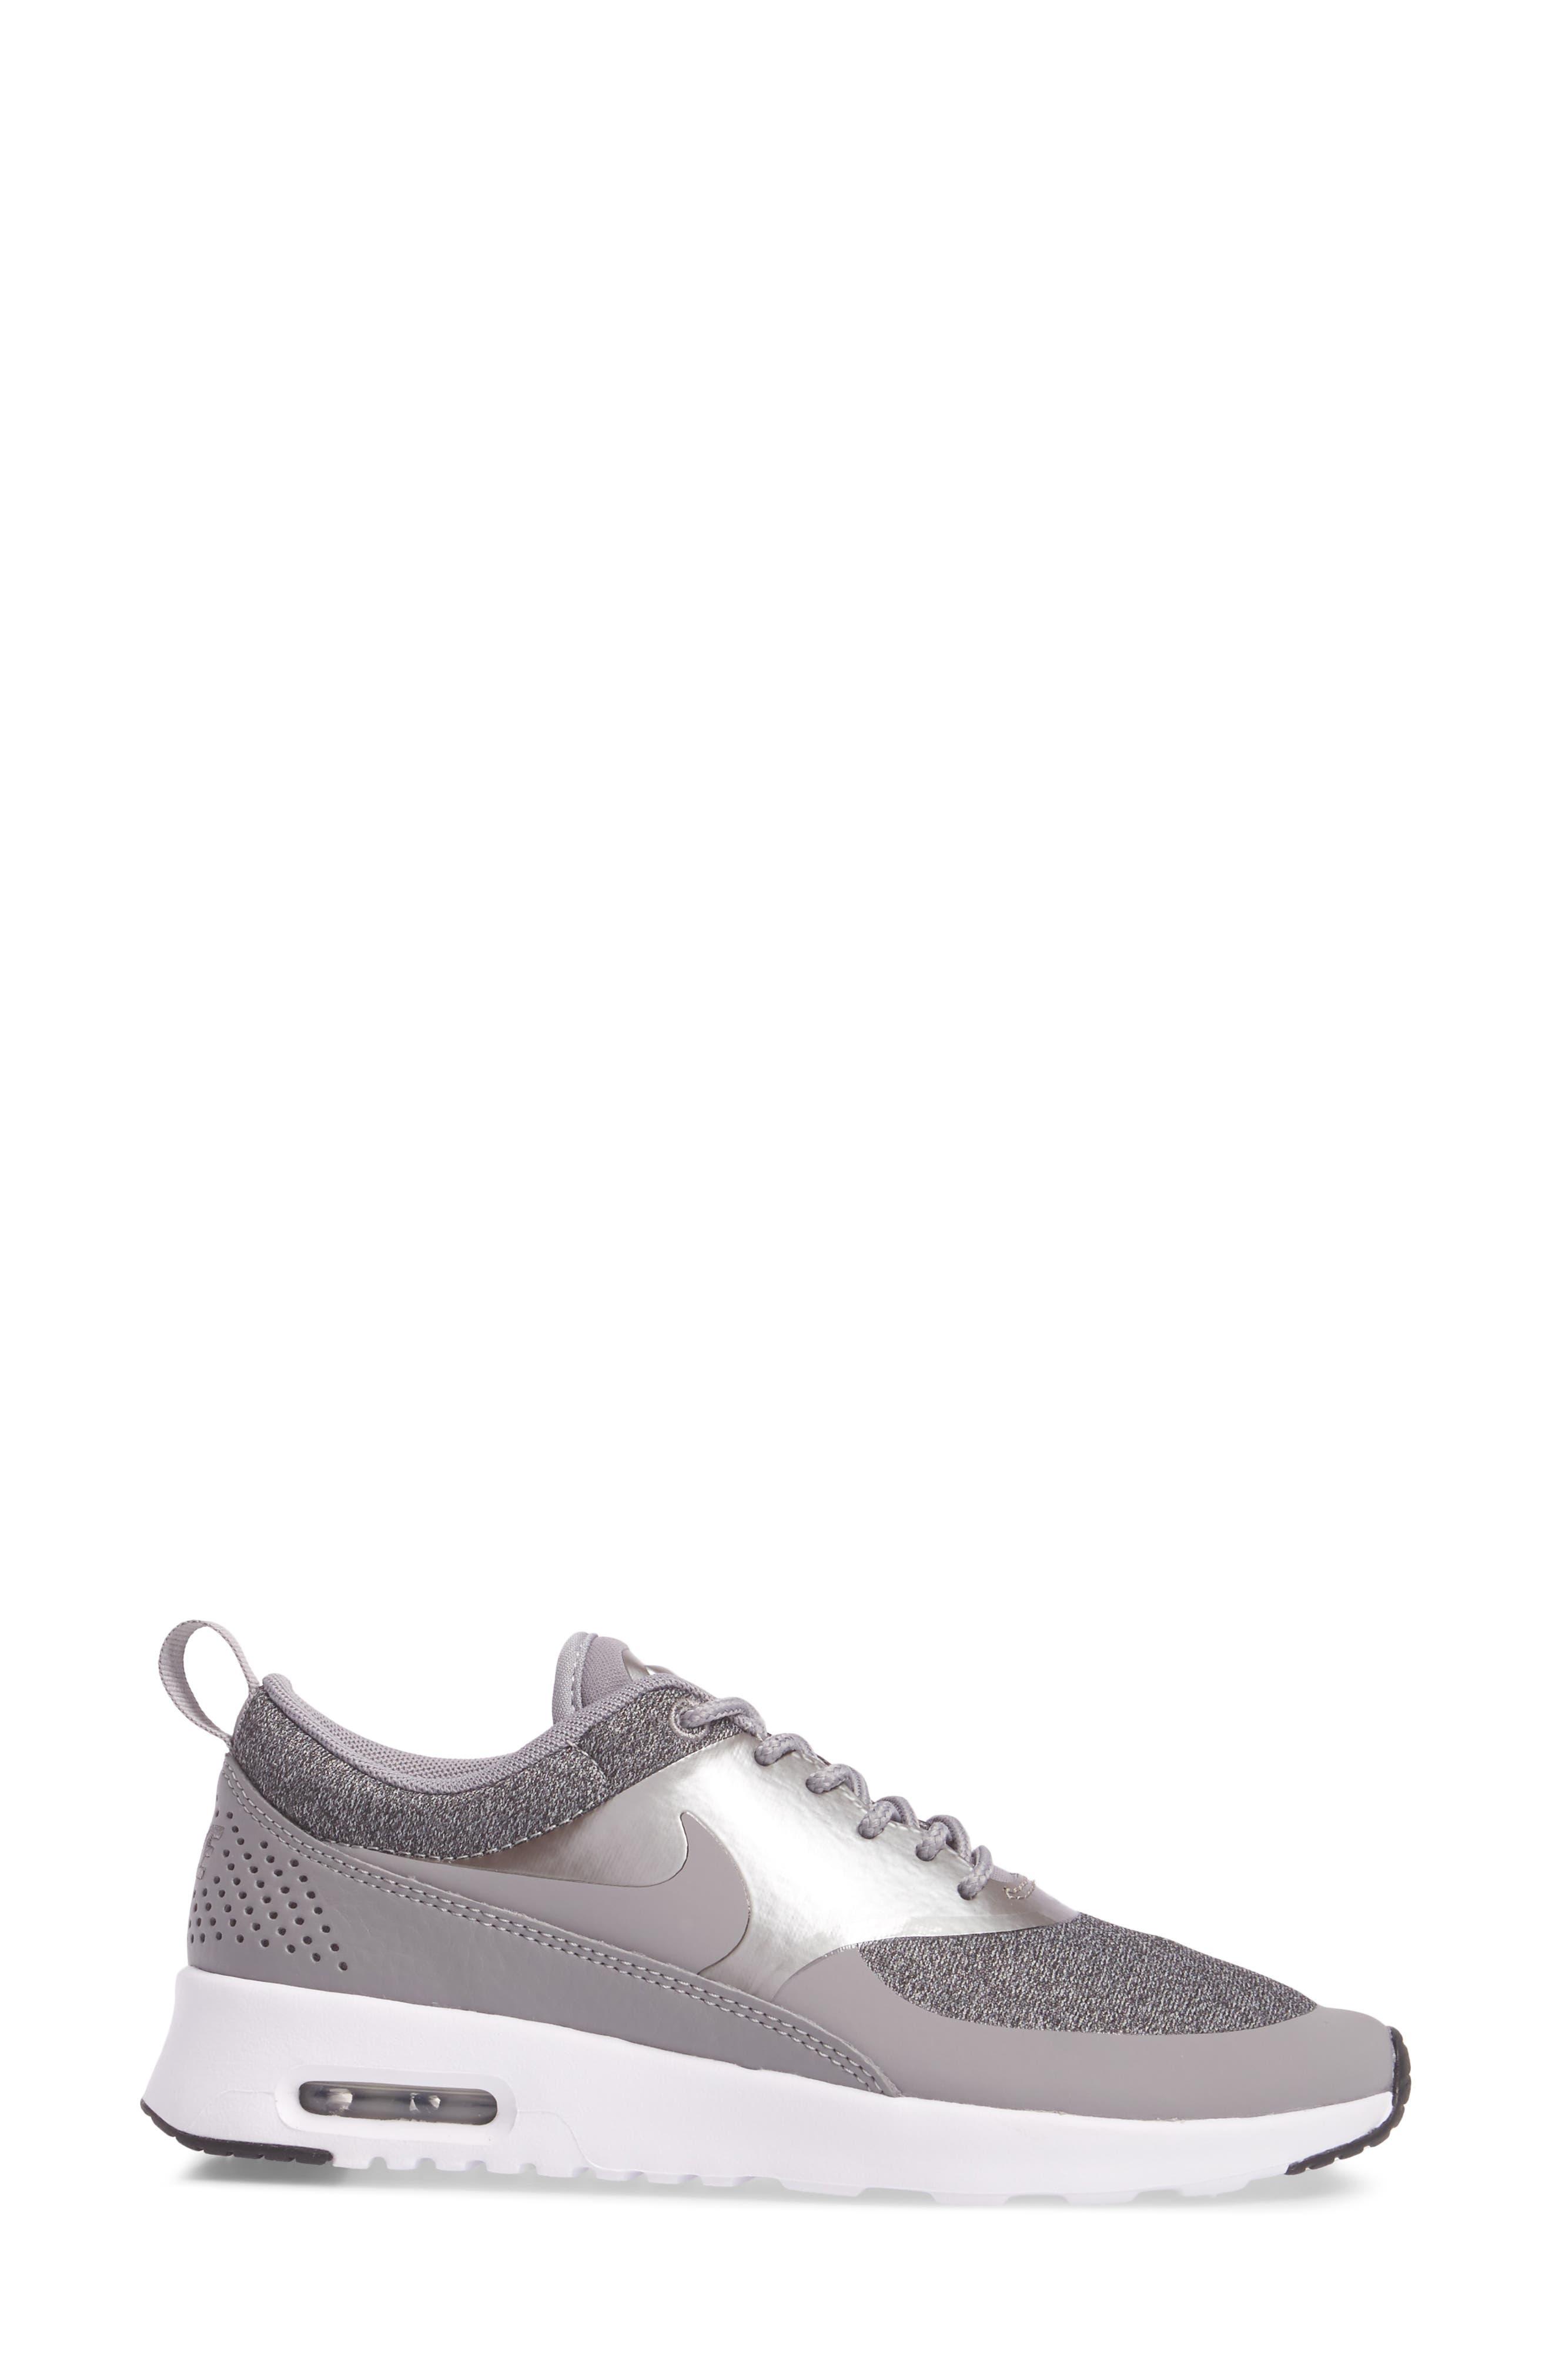 Air Max Thea Knit Sneaker,                             Alternate thumbnail 3, color,                             020